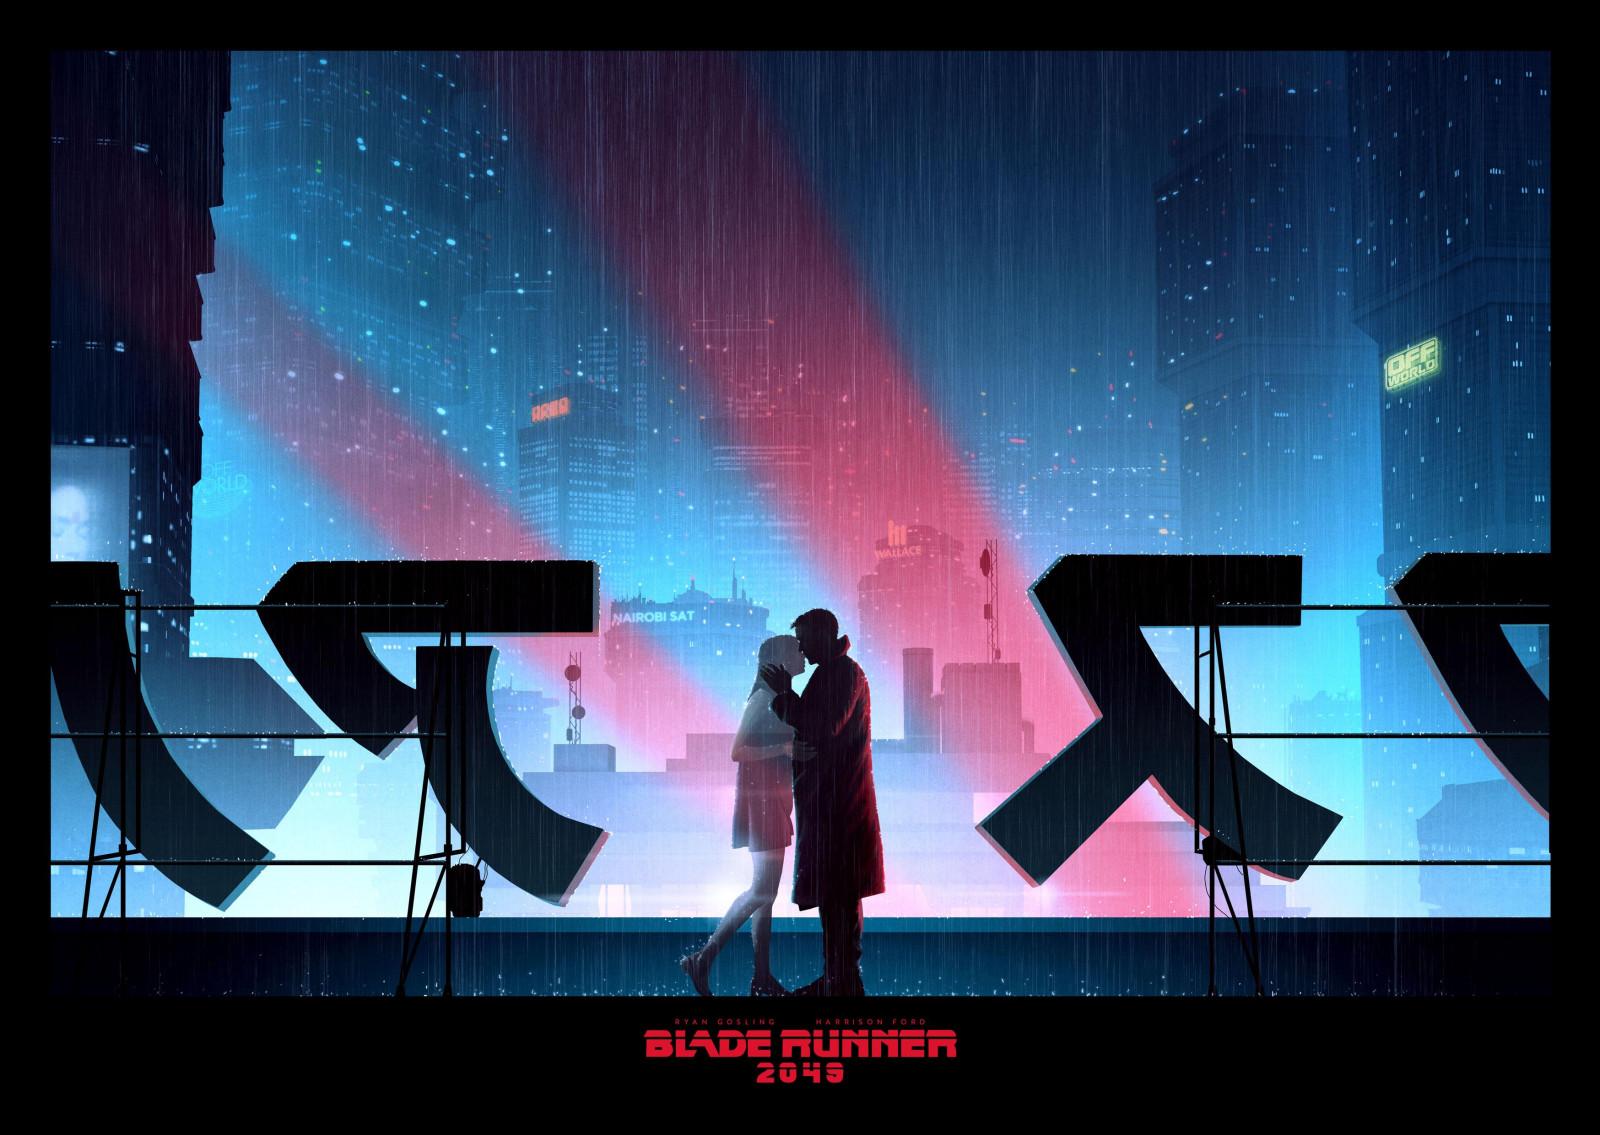 Wallpaper : Blade Runner, movies, blade runner 2049 ...